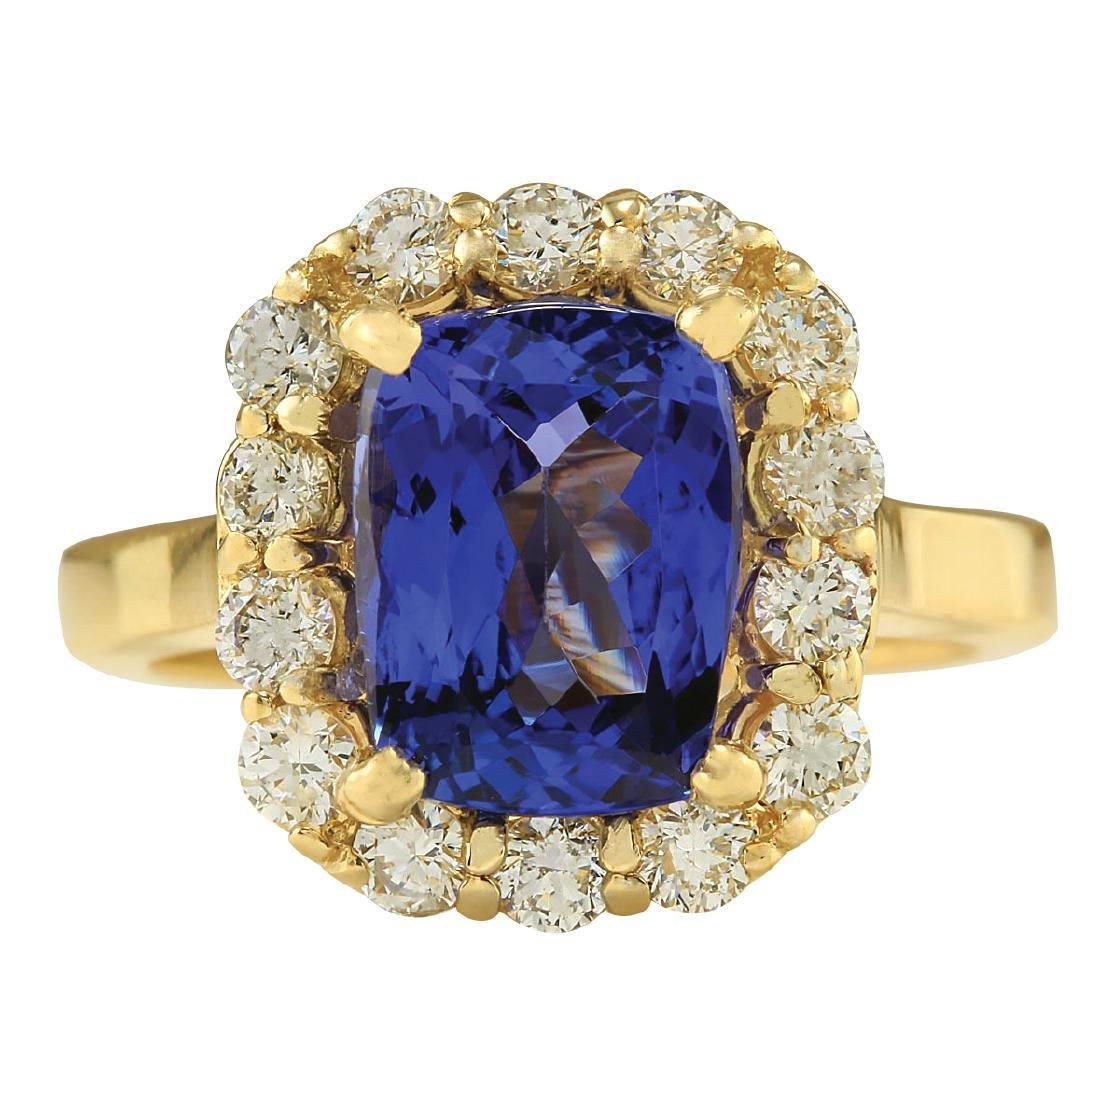 4.15CTW Natural Tanzanite And Diamond Ring In 18K